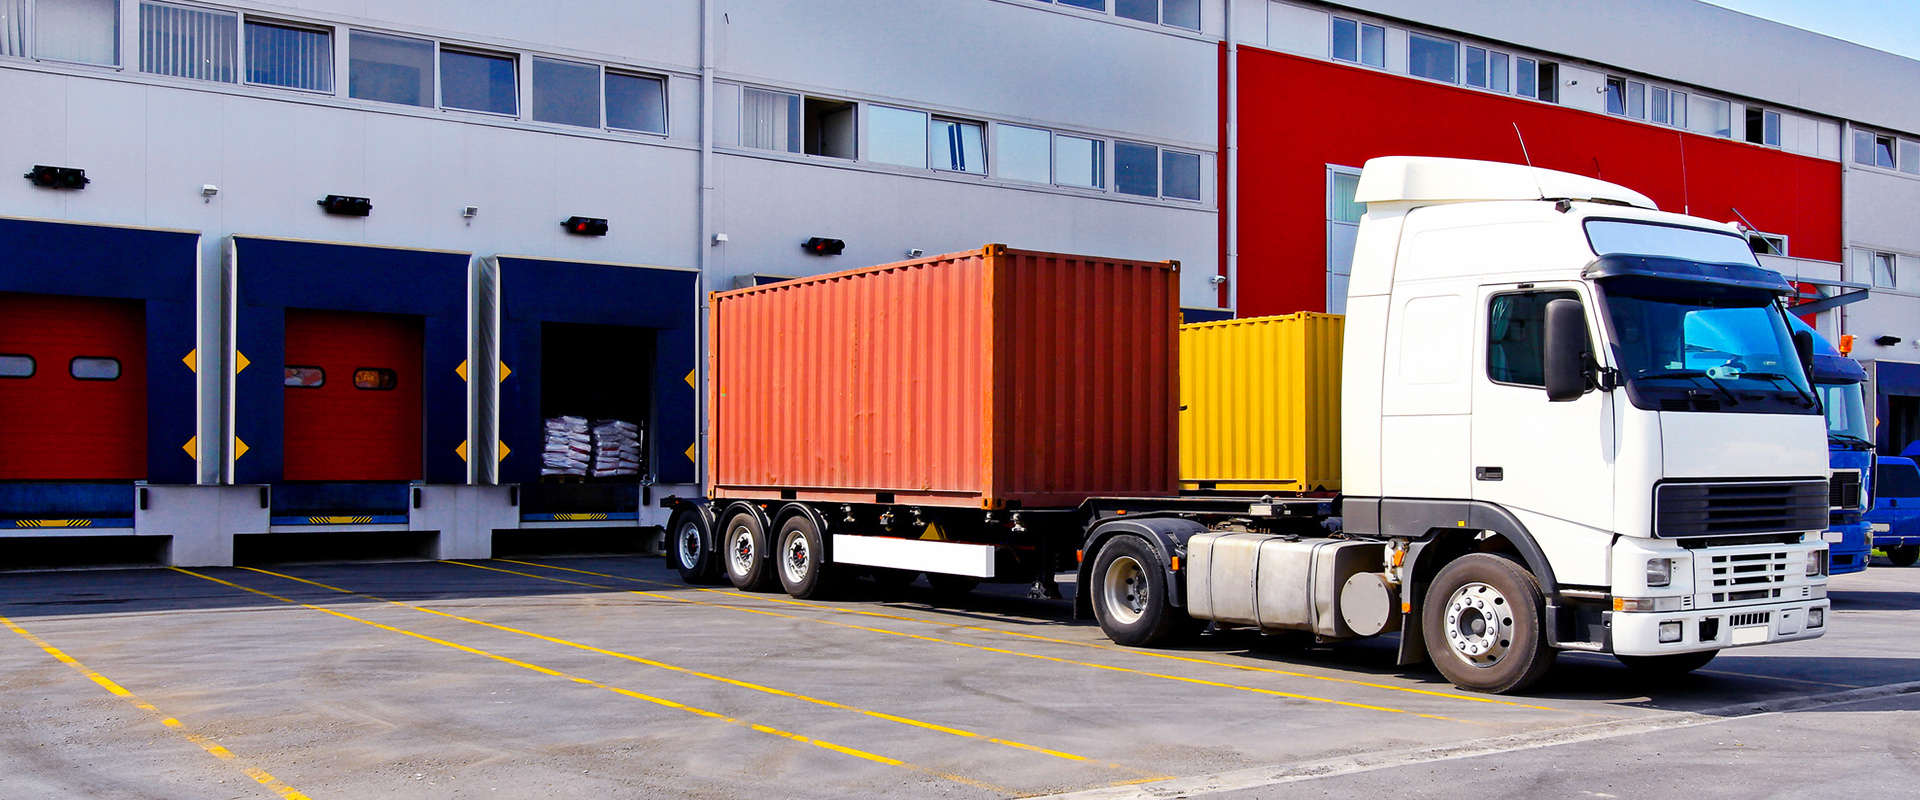 supQFS自动化装卸车控制行业解决方案